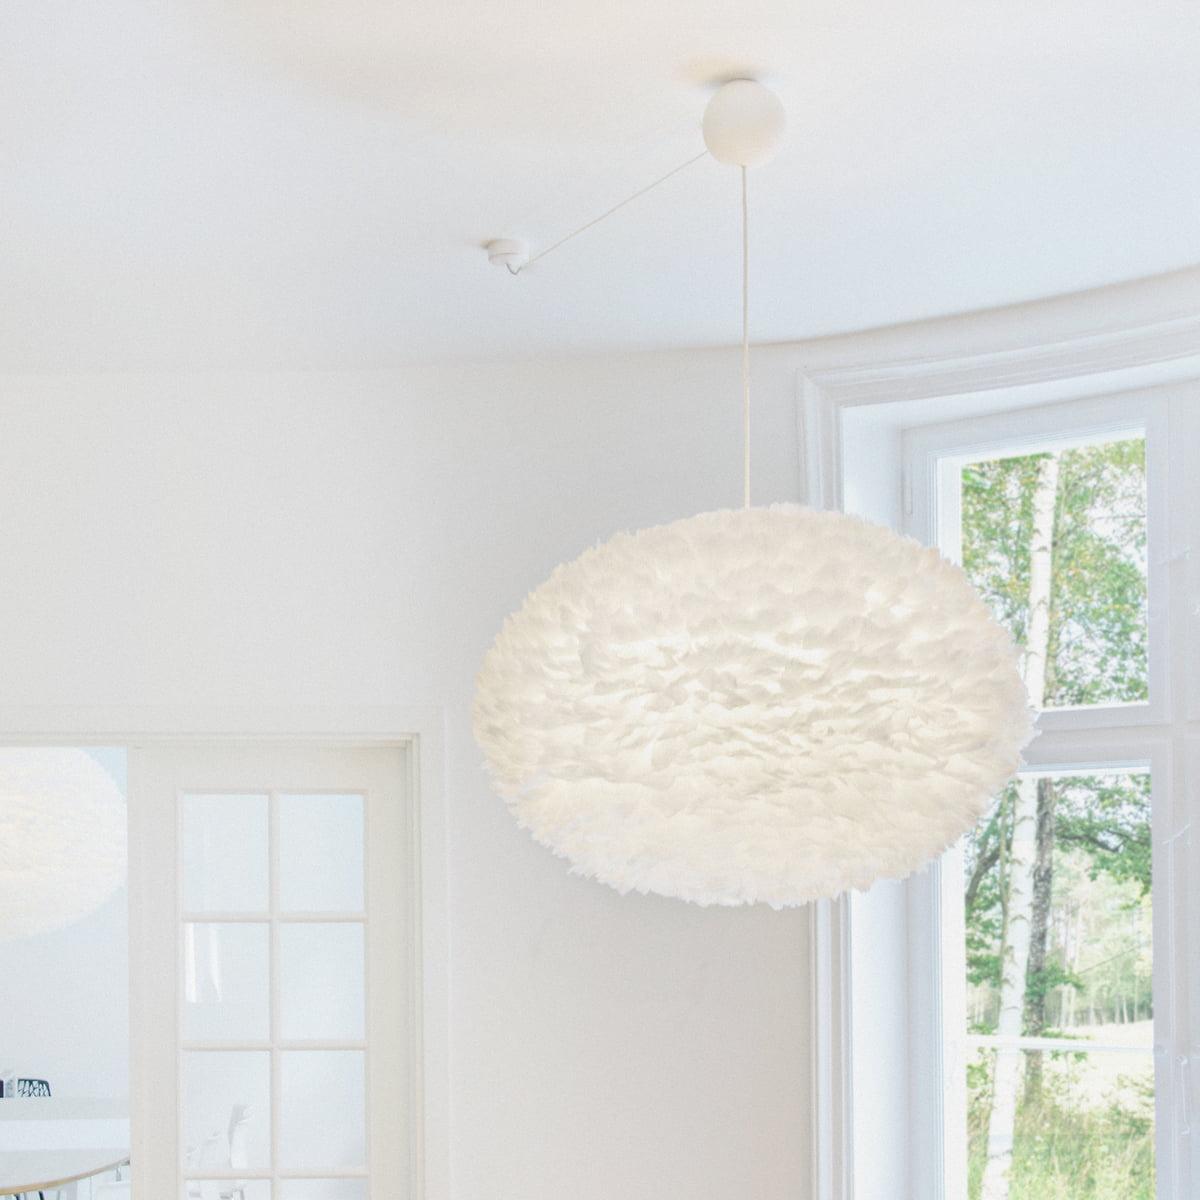 Pleasant Light and Design  sc 1 st  Connox & Eos Créme by Vita in the interior design shop azcodes.com